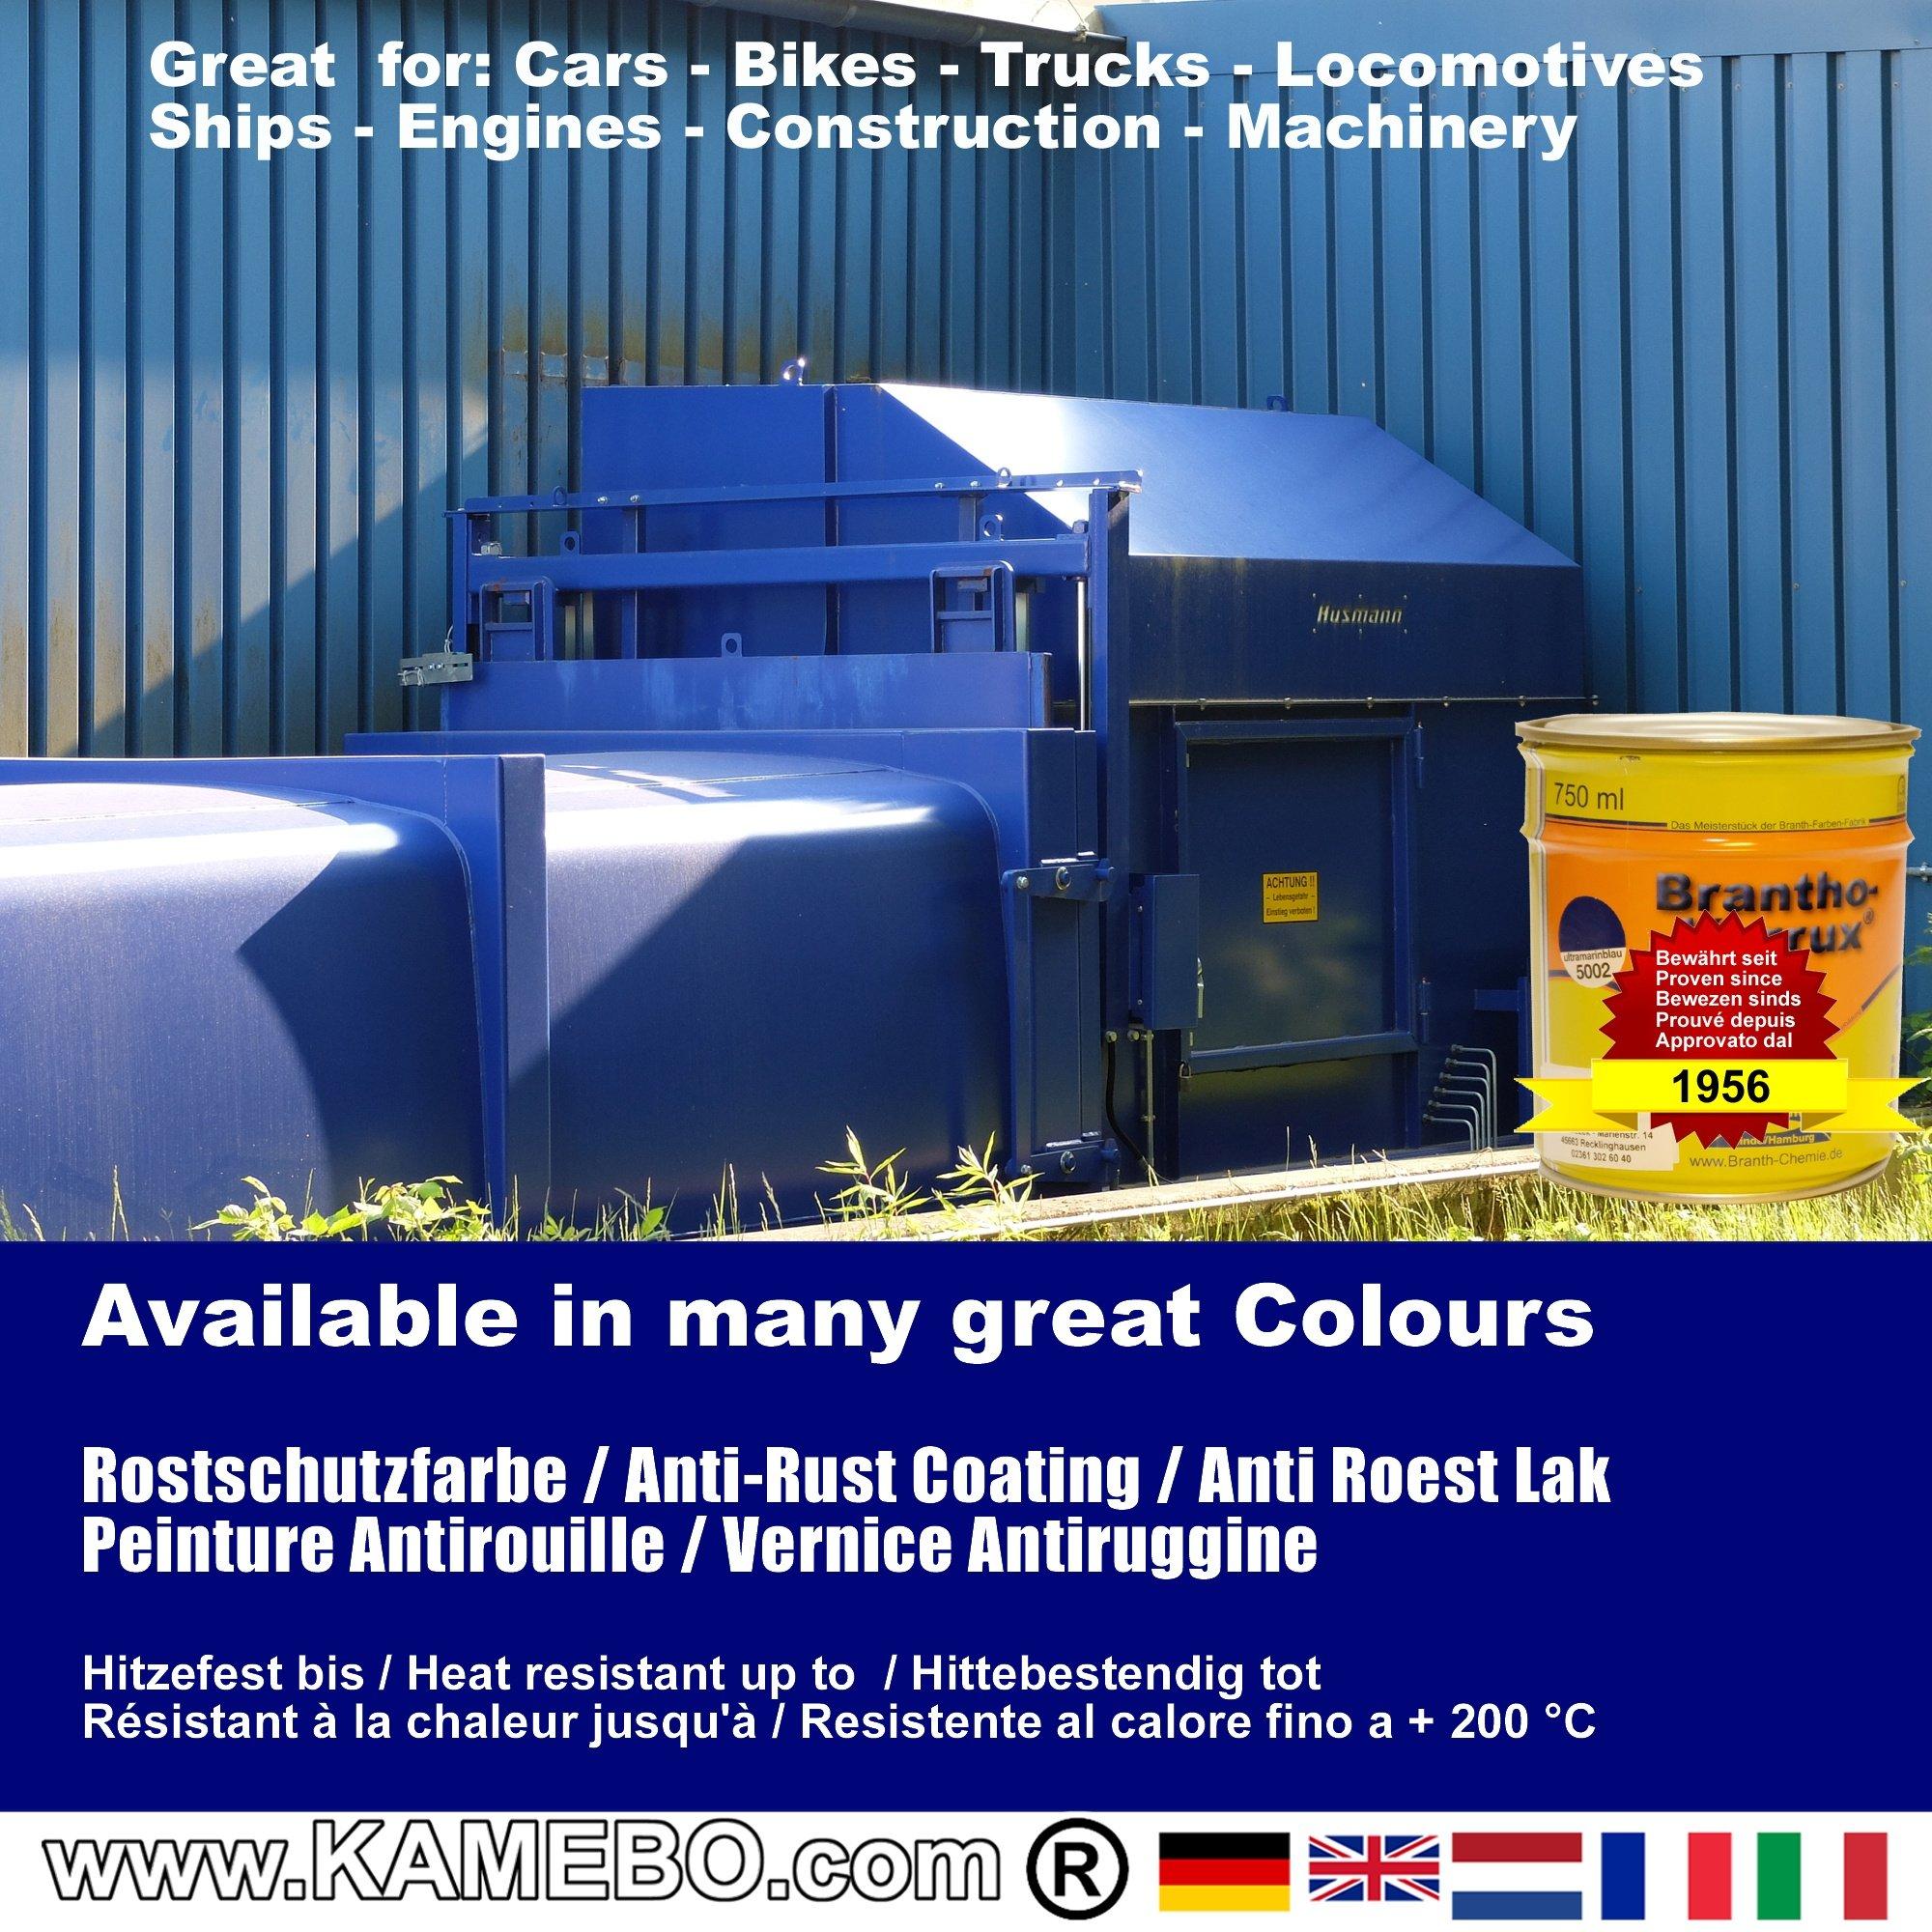 Brantho Korrux 3in1 Peinture Antirouille Ral 5002 Bleu